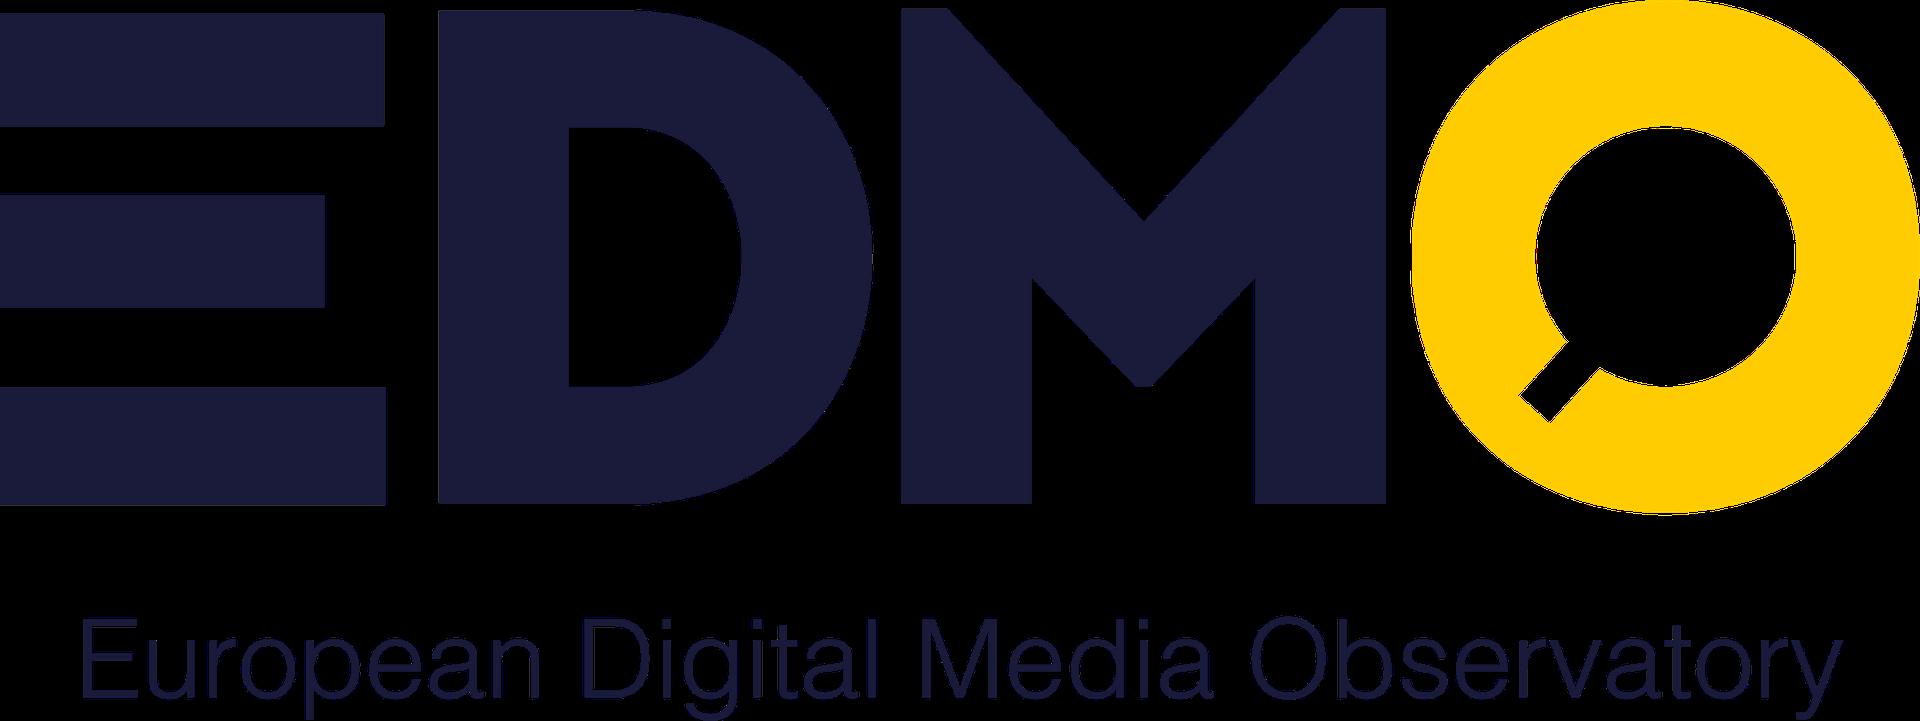 EDMO logo .png